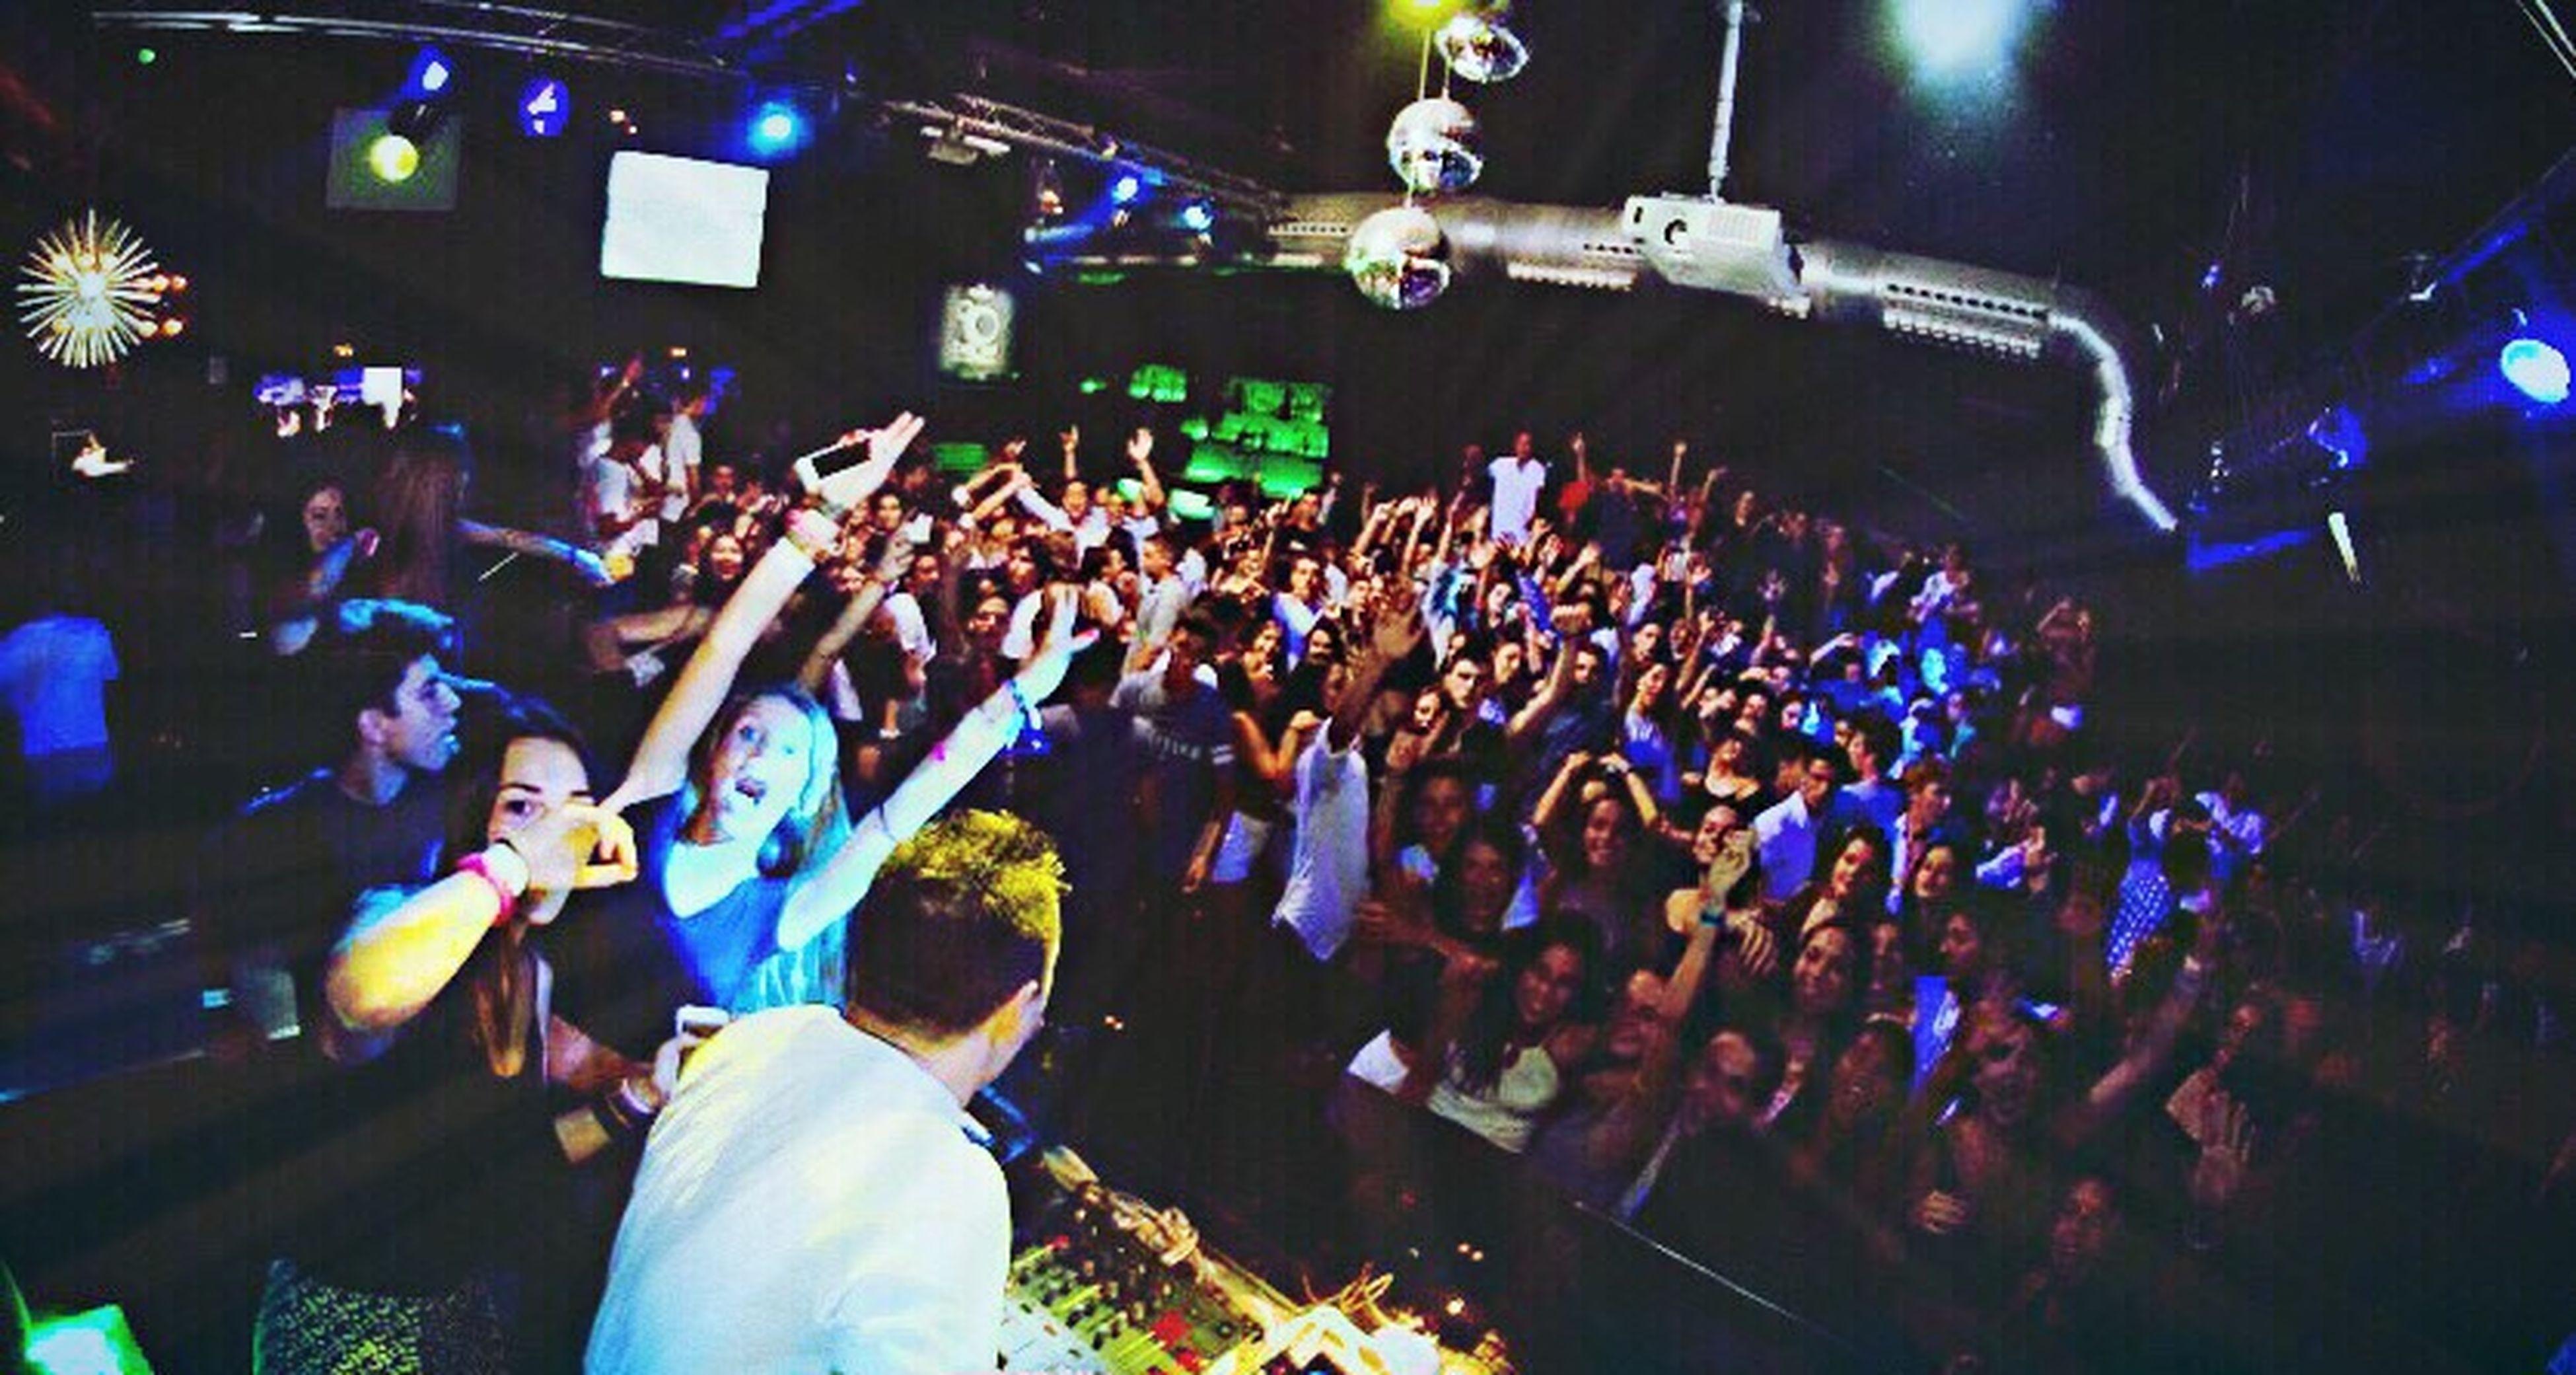 Festival Season Check This Out Party Nightlife Europeparty Club Enjoying Life